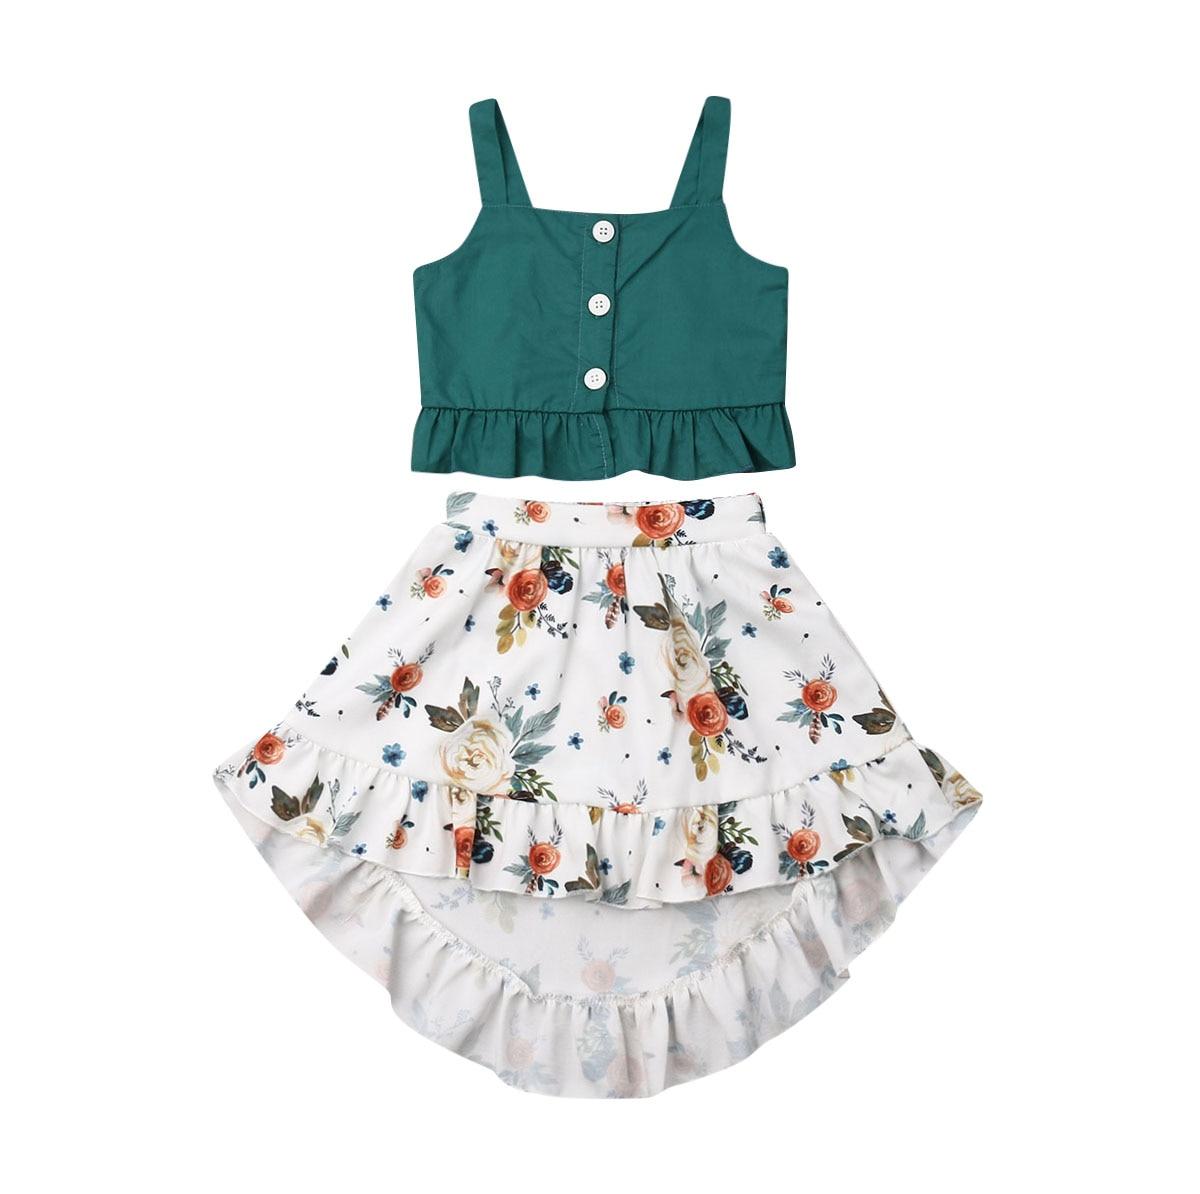 Toddler Newborn Kids Baby Girls Cartoon Floral Sleeveless Strap Princess Dresses